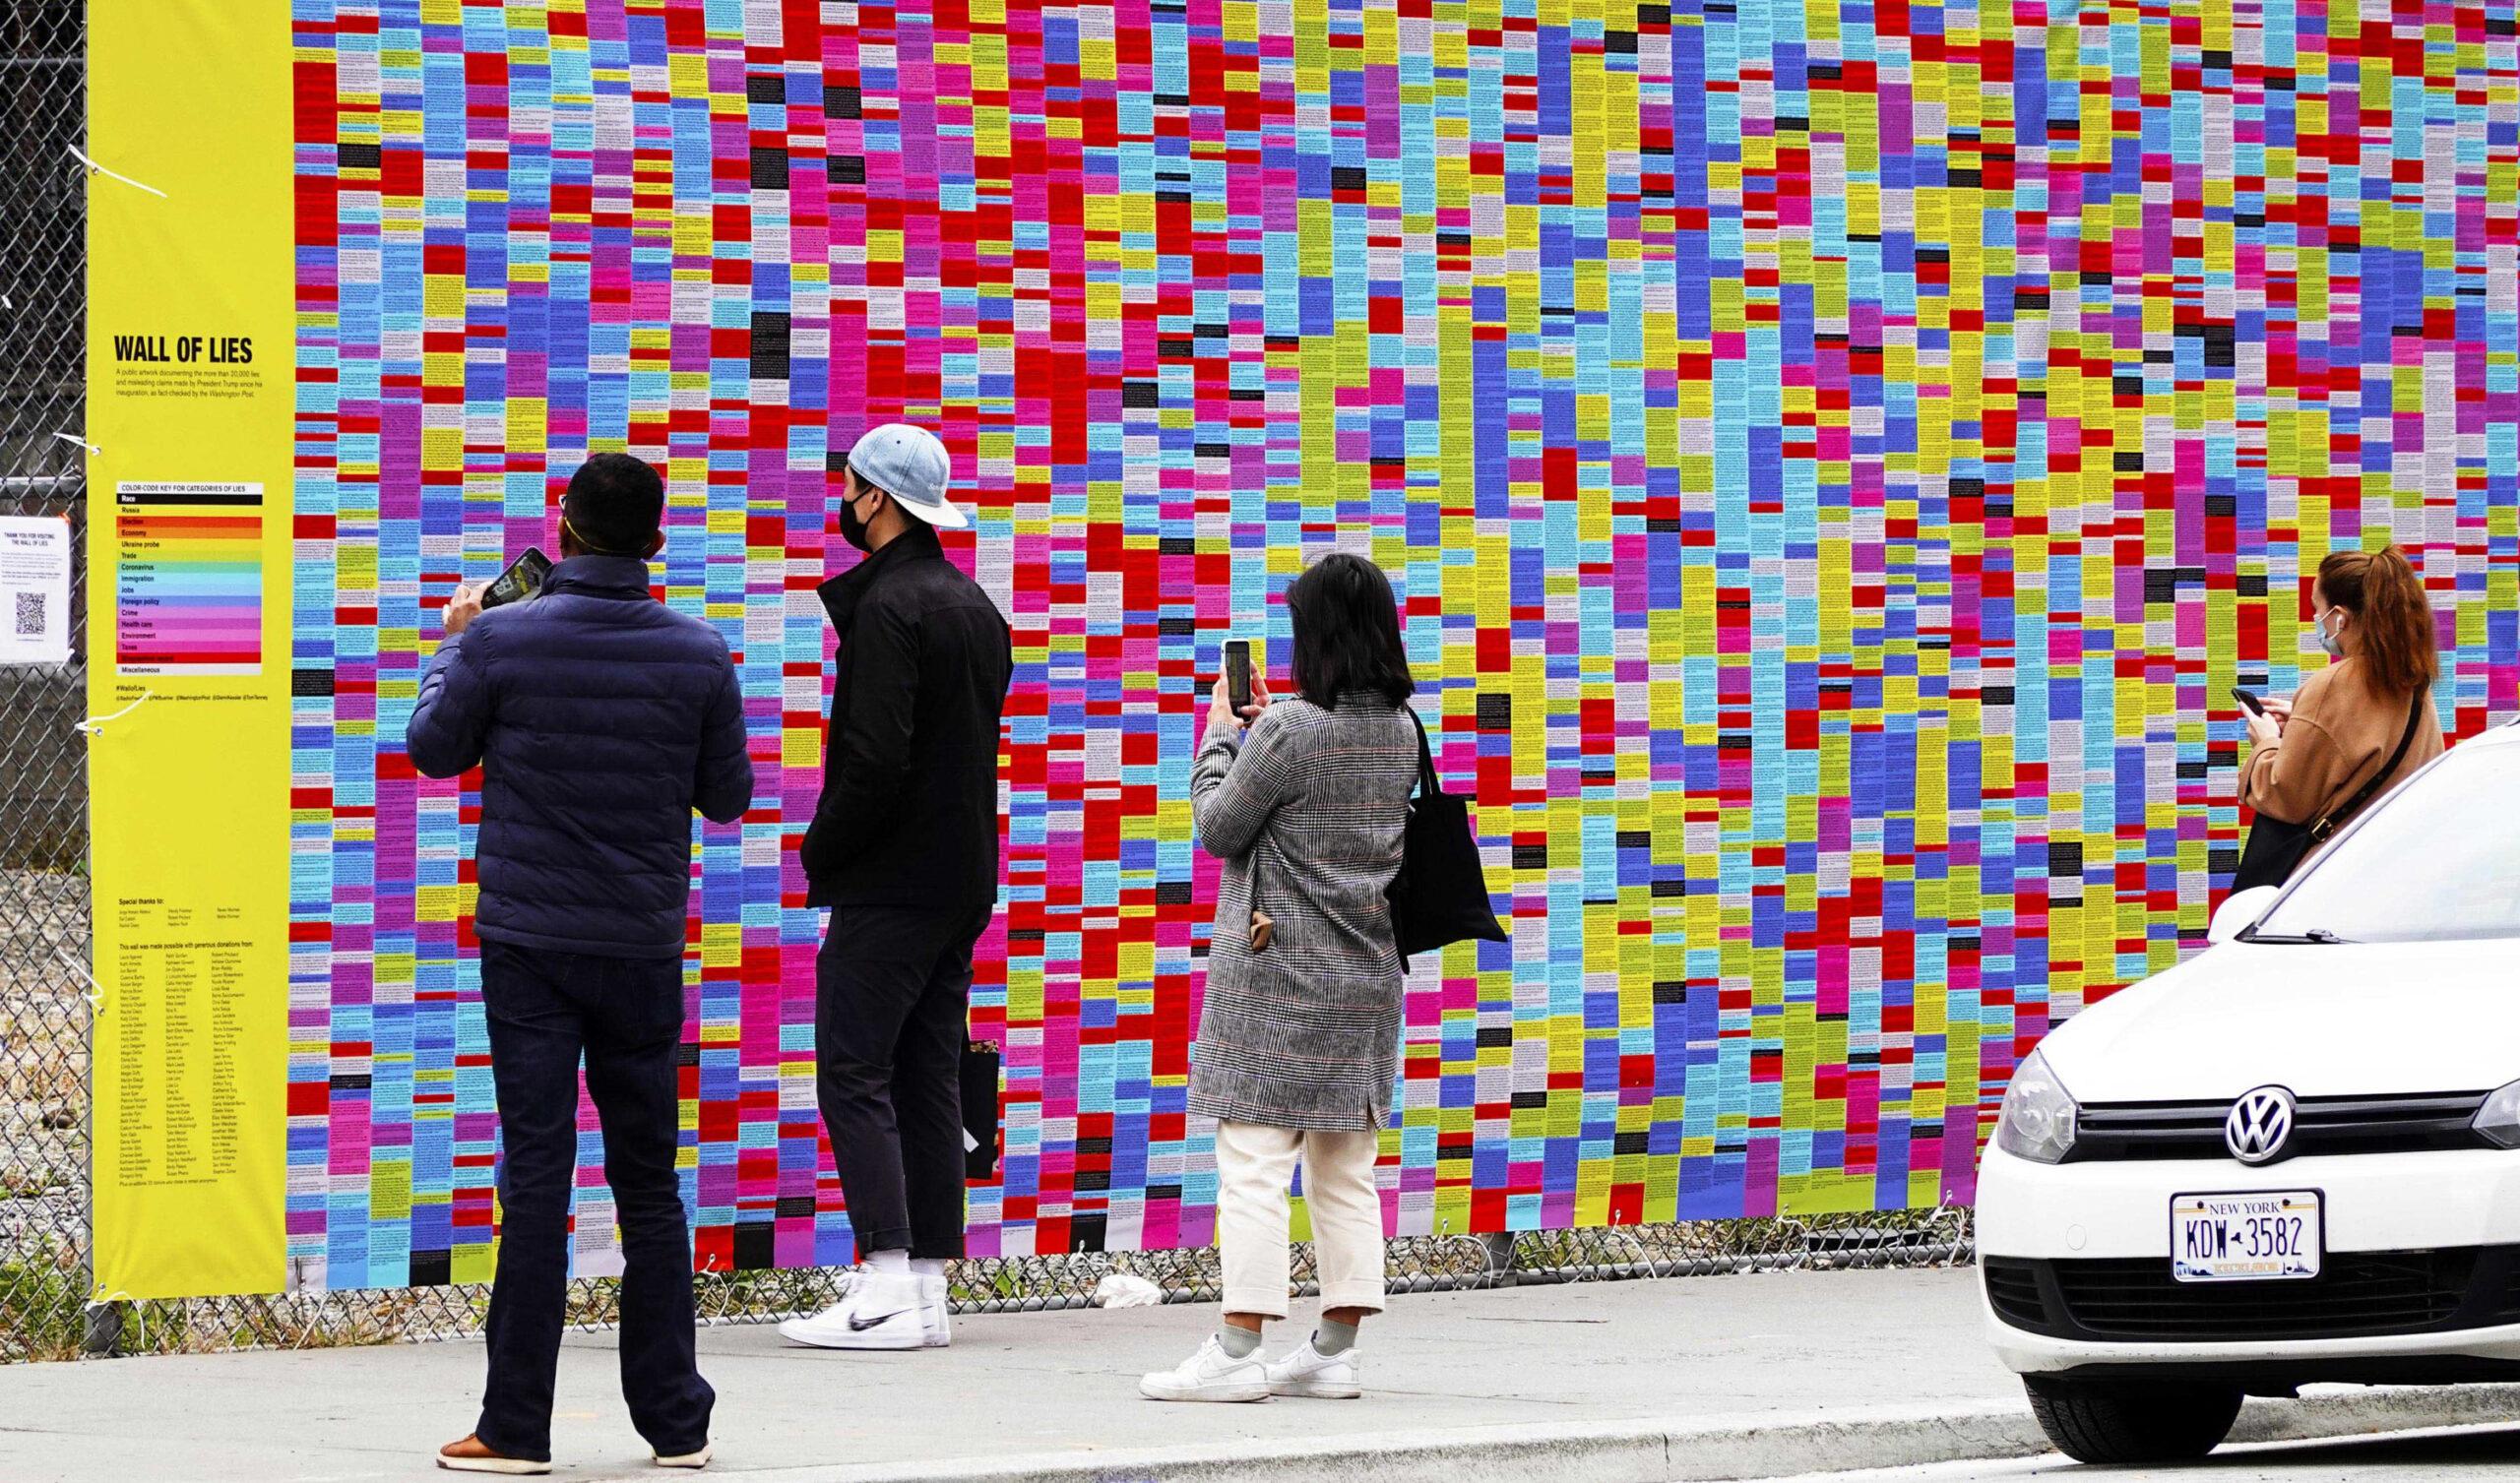 Mur des mensonges NYC